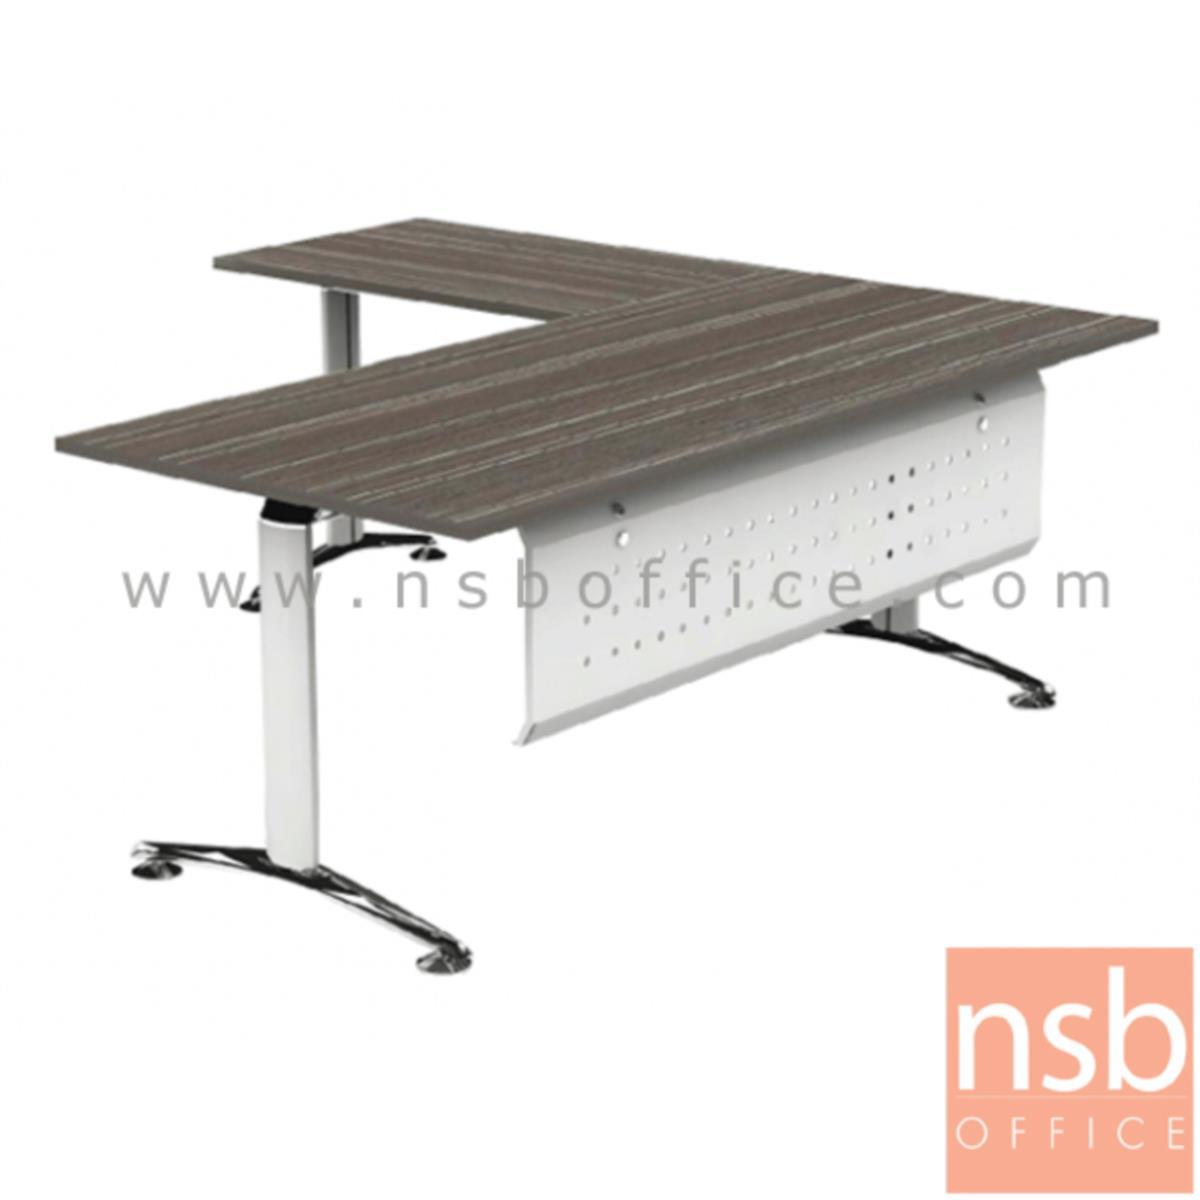 A30A002:โต๊ะทำงานตัวแอล  รุ่น HB-EX3DL2019  ขนาด 200W1*190W2 cm. ขาอลูมิเนียม